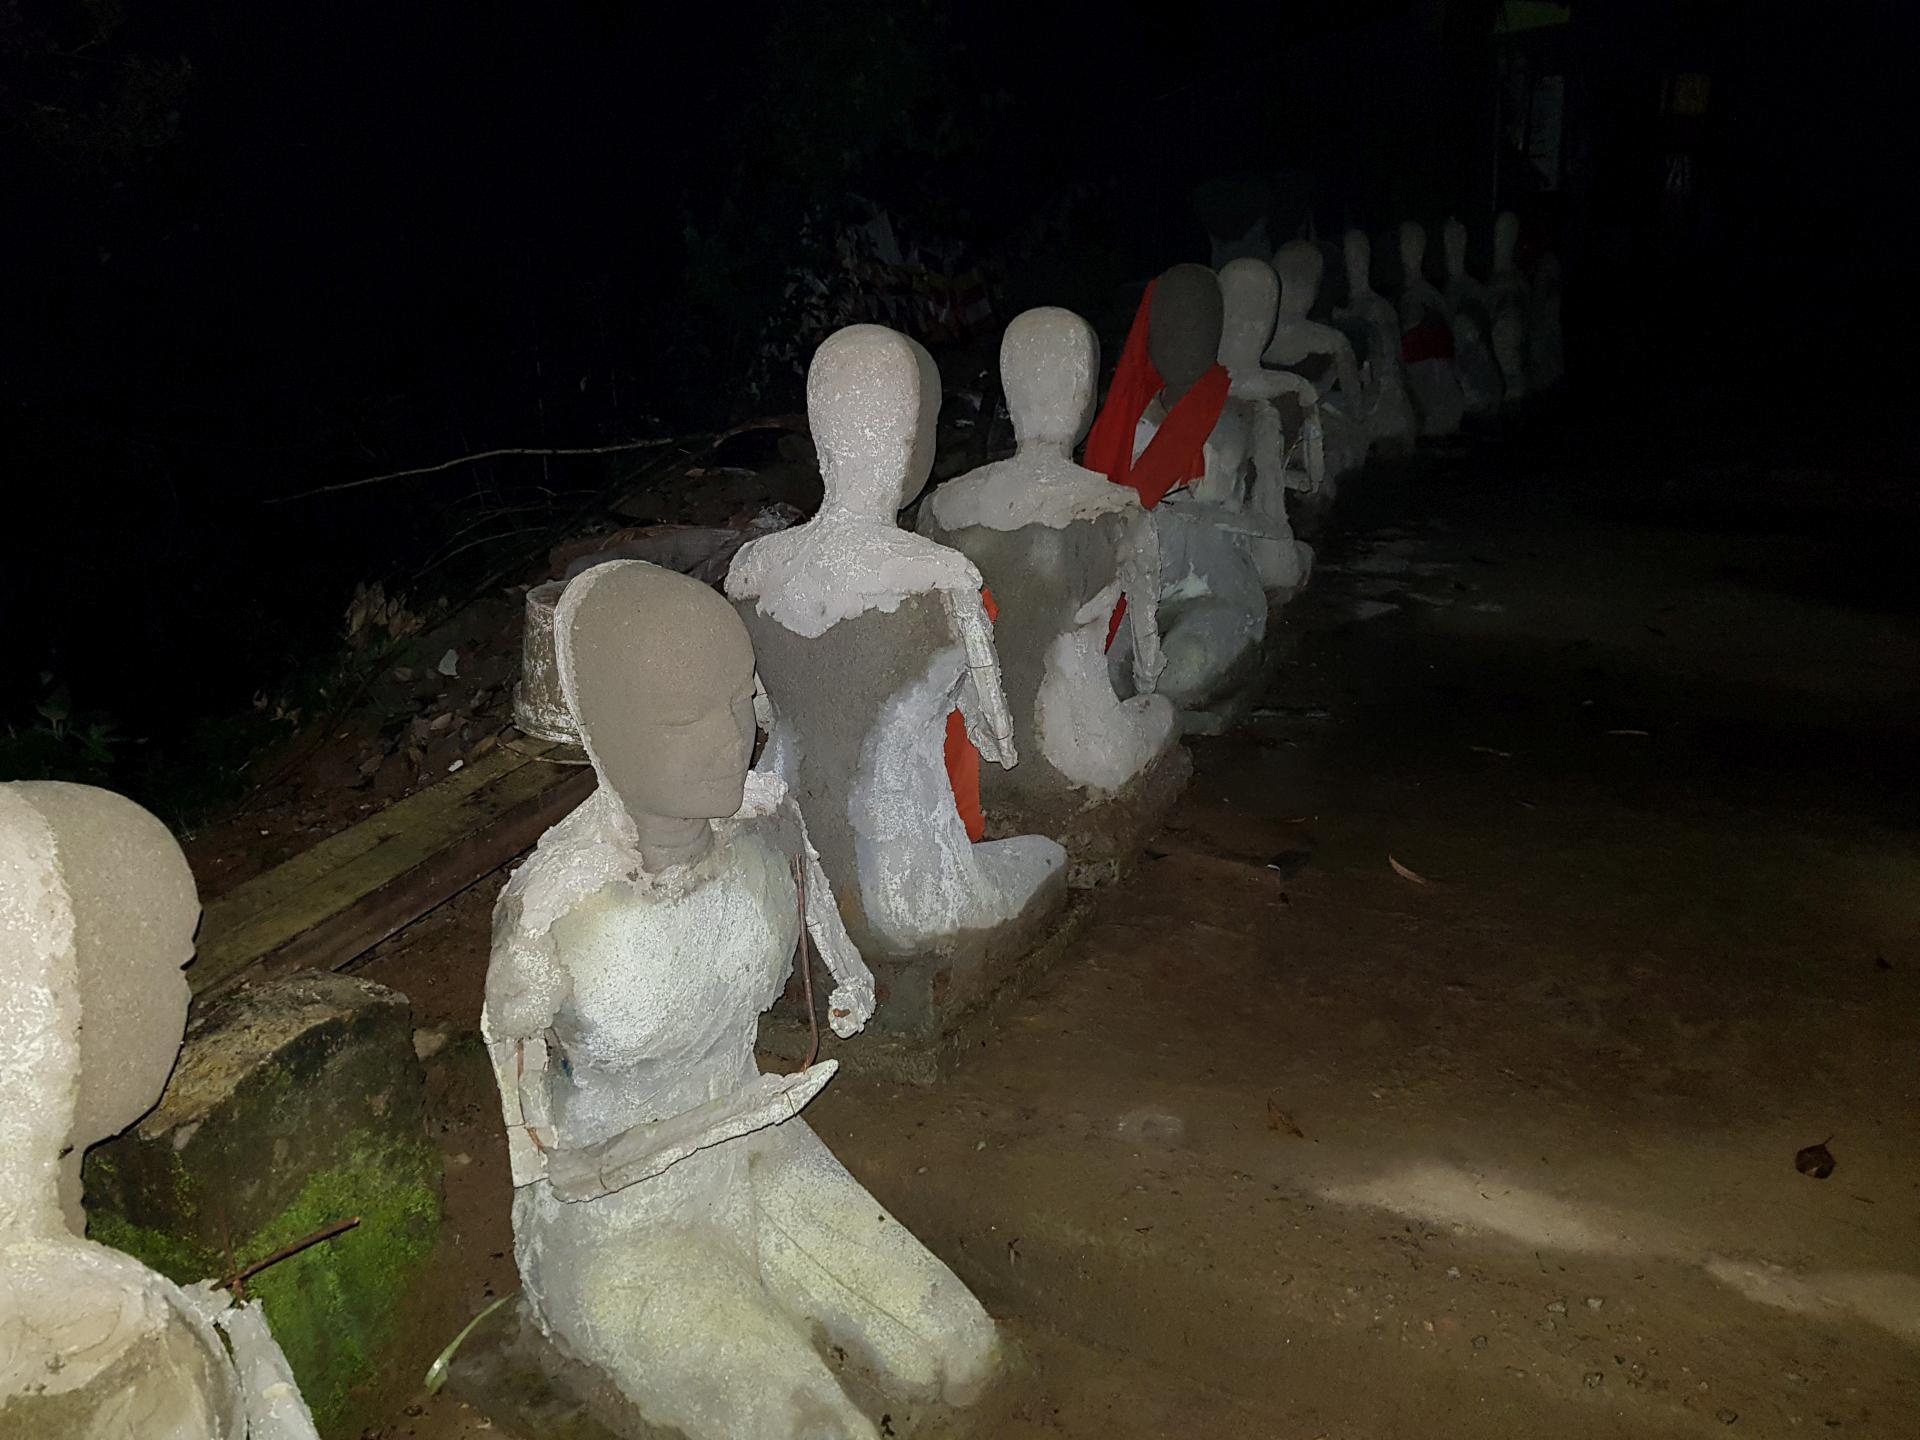 каменные статуи на тропе к пику Адама